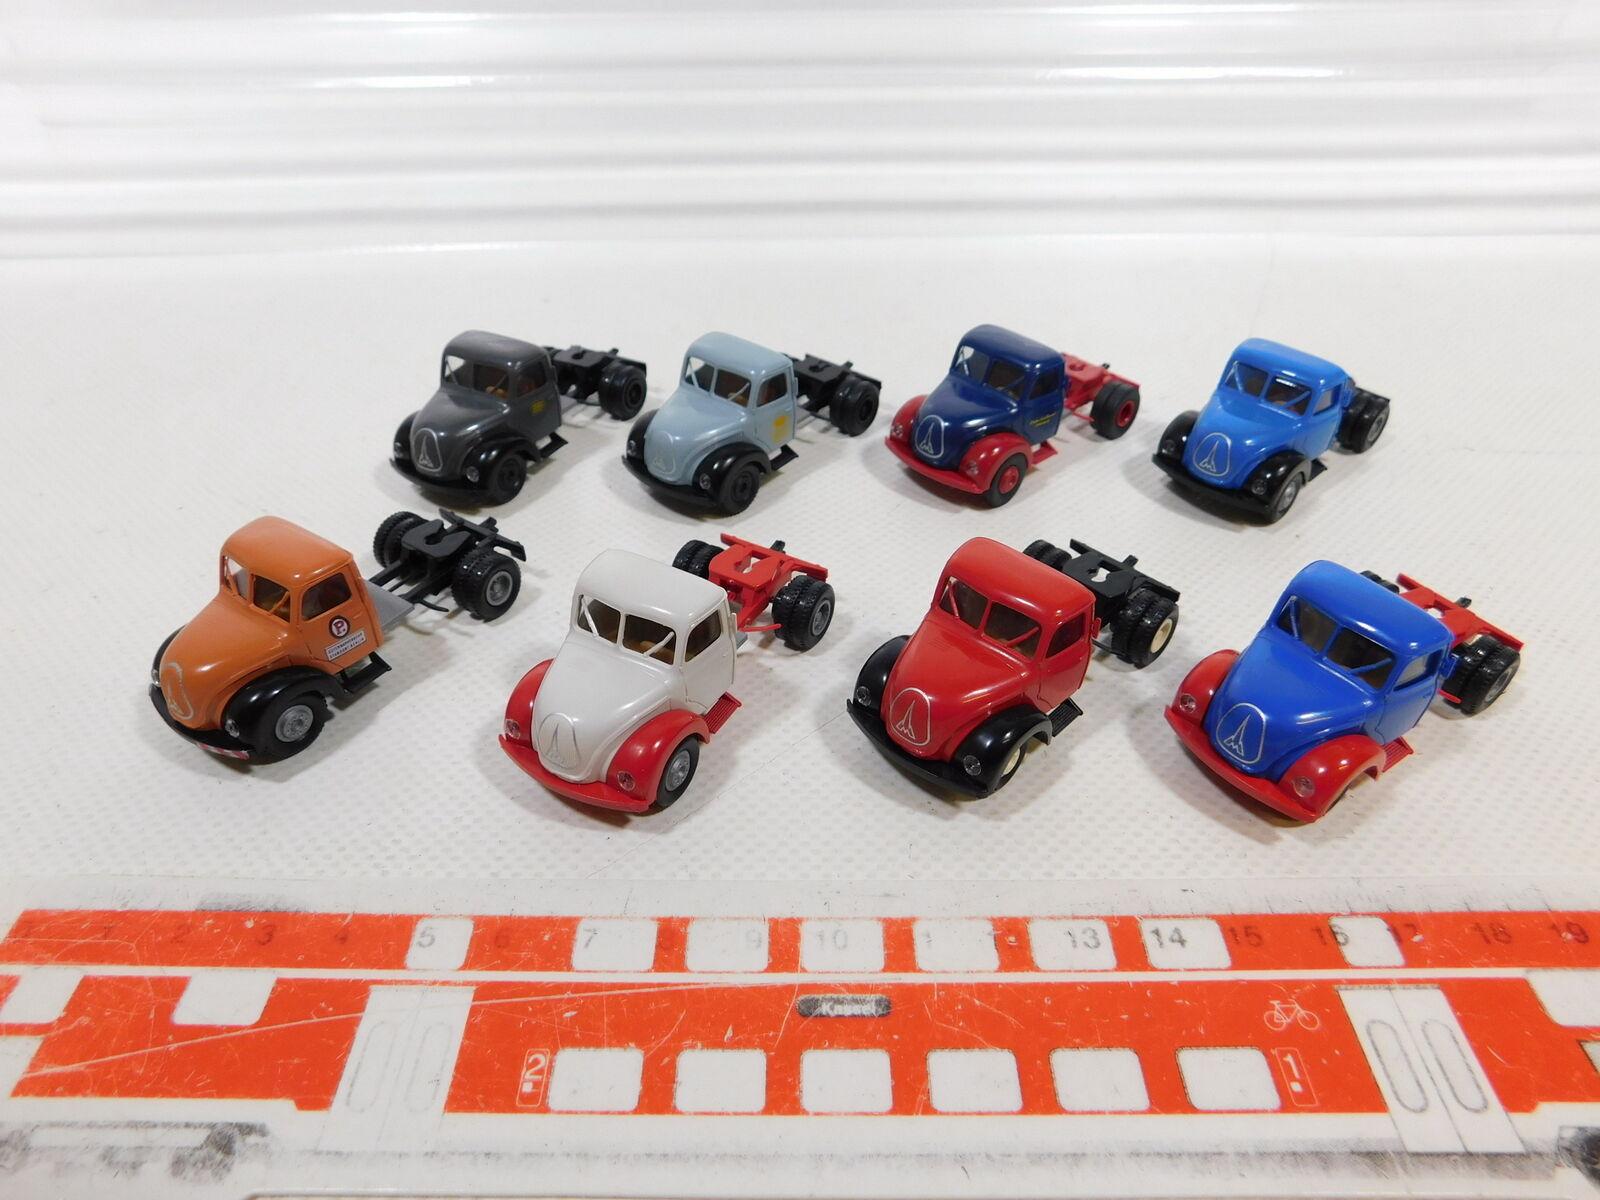 Ca384-0, 5  8x 1 87 h0 brekina truck magirus  Edeka + DB + weihenstephan etc, top